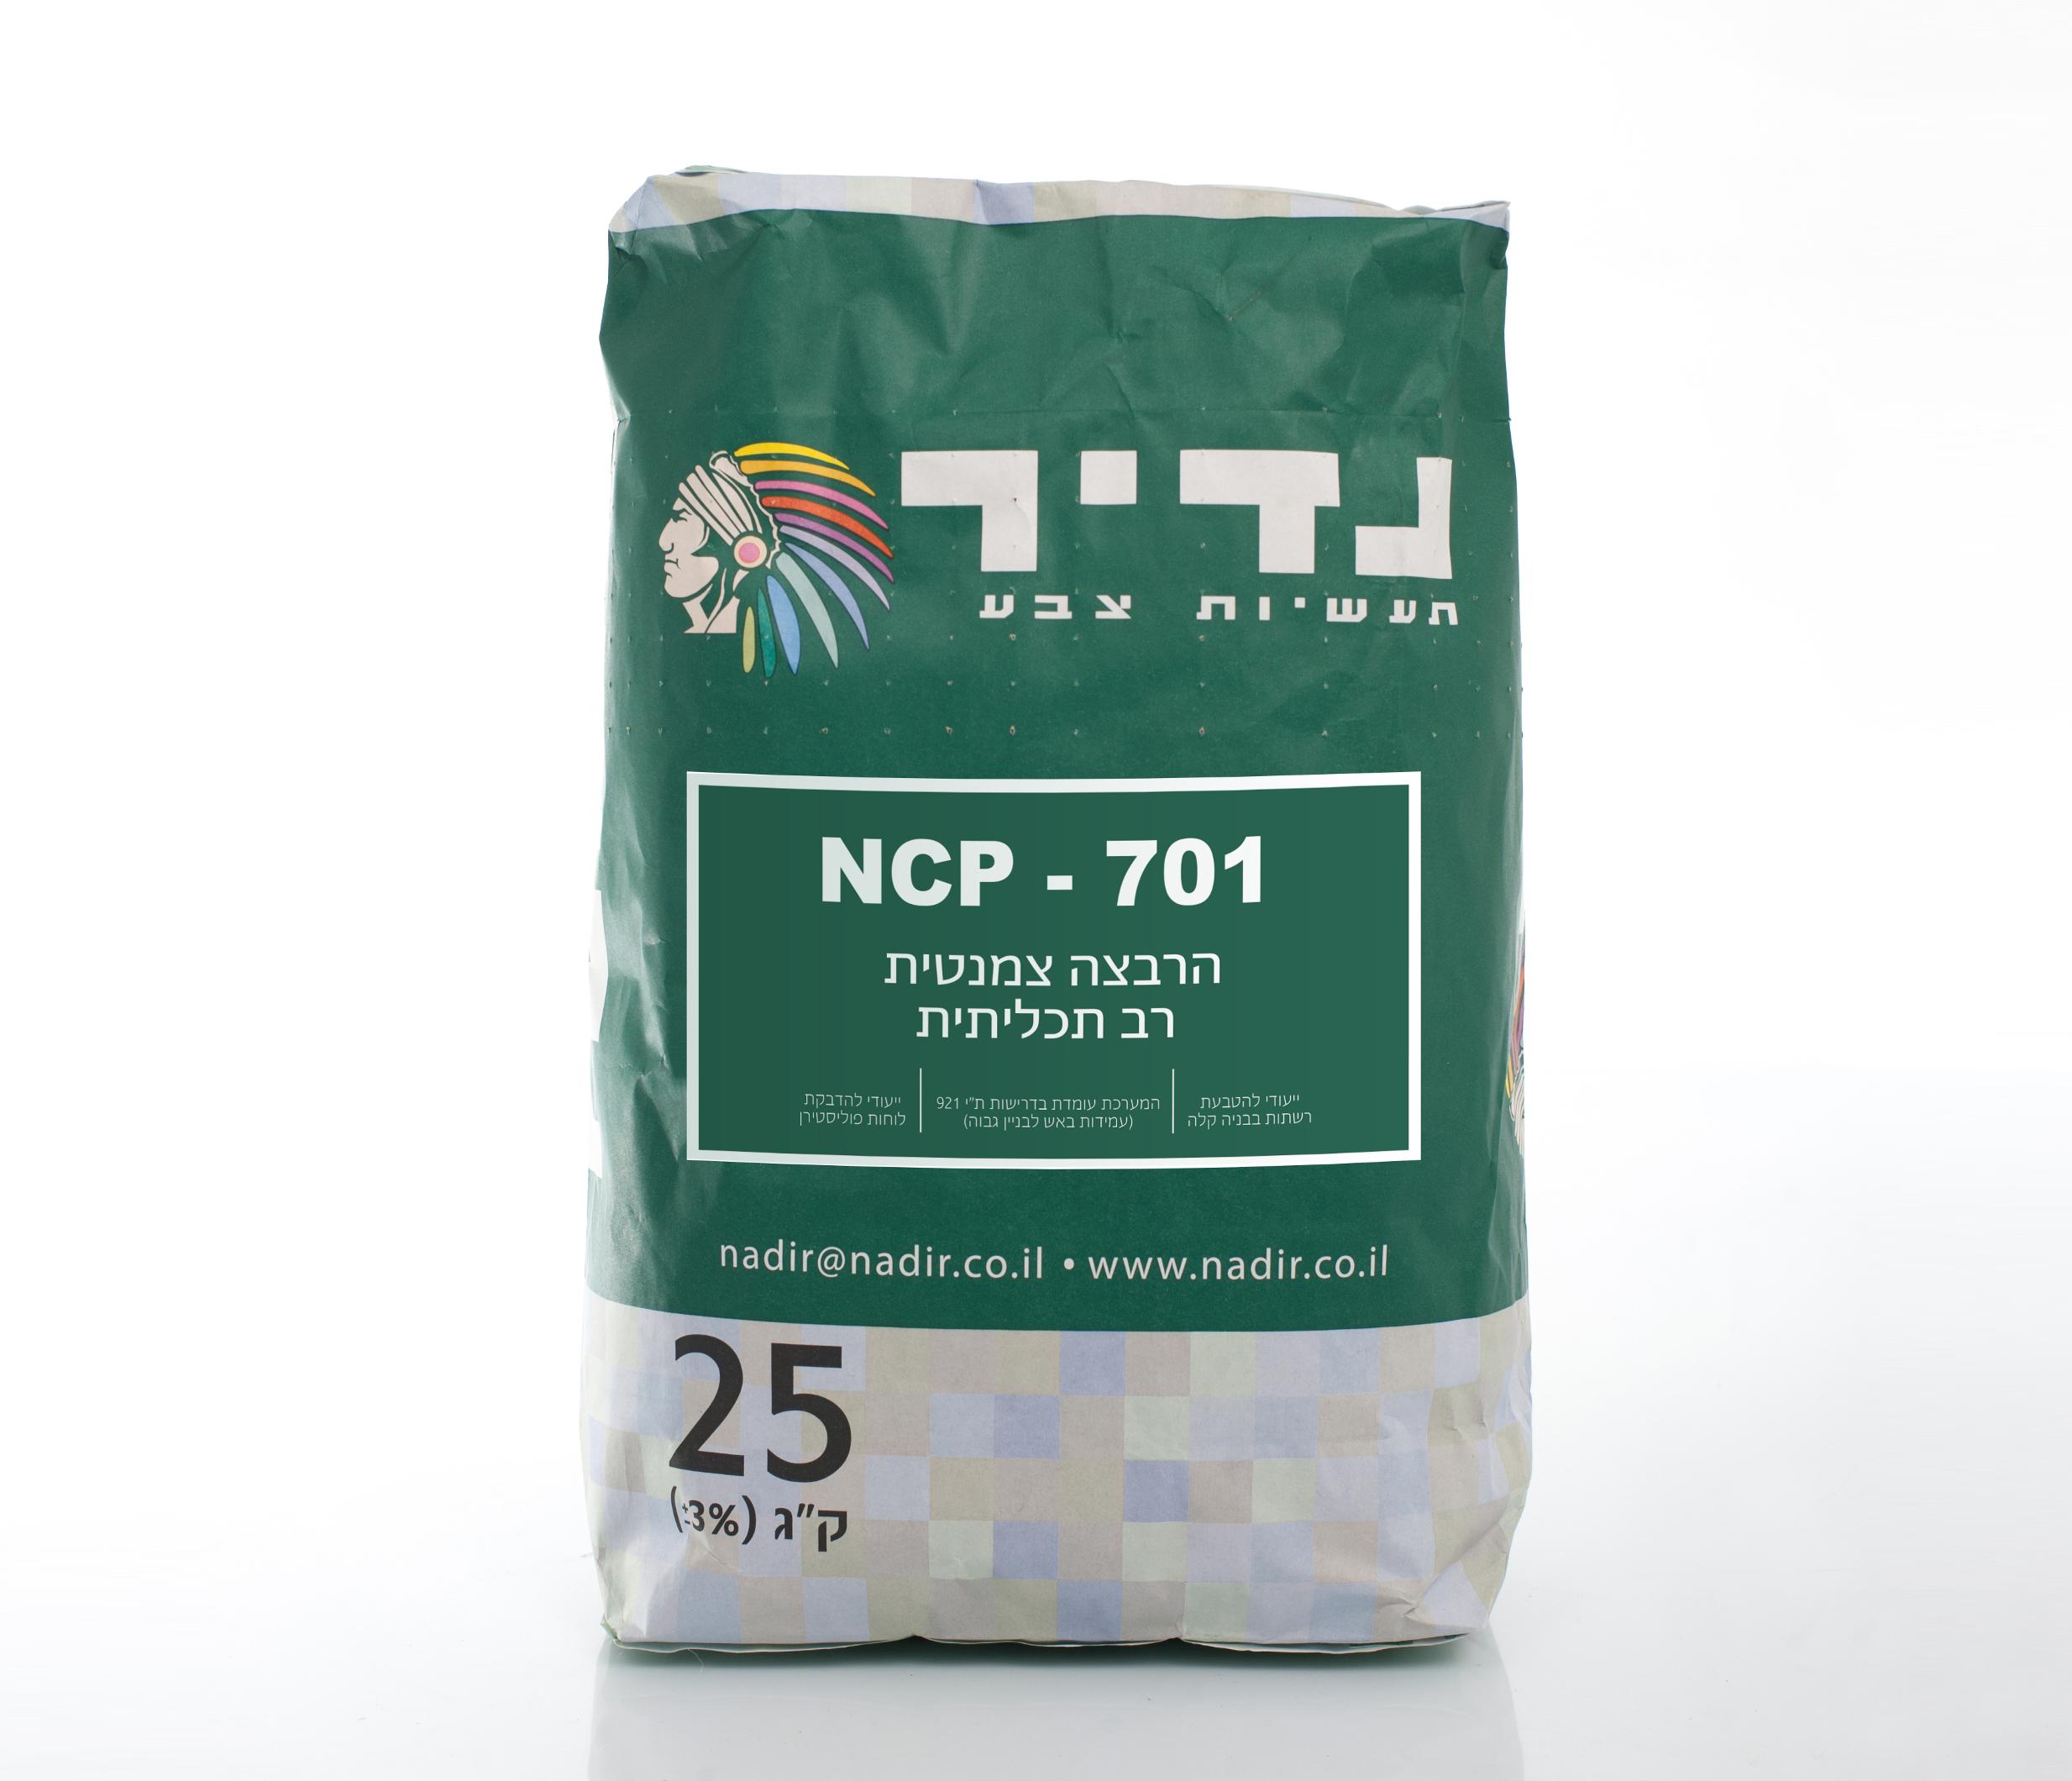 NCP 701 הרבצה צמנטית שכבה מקשרת